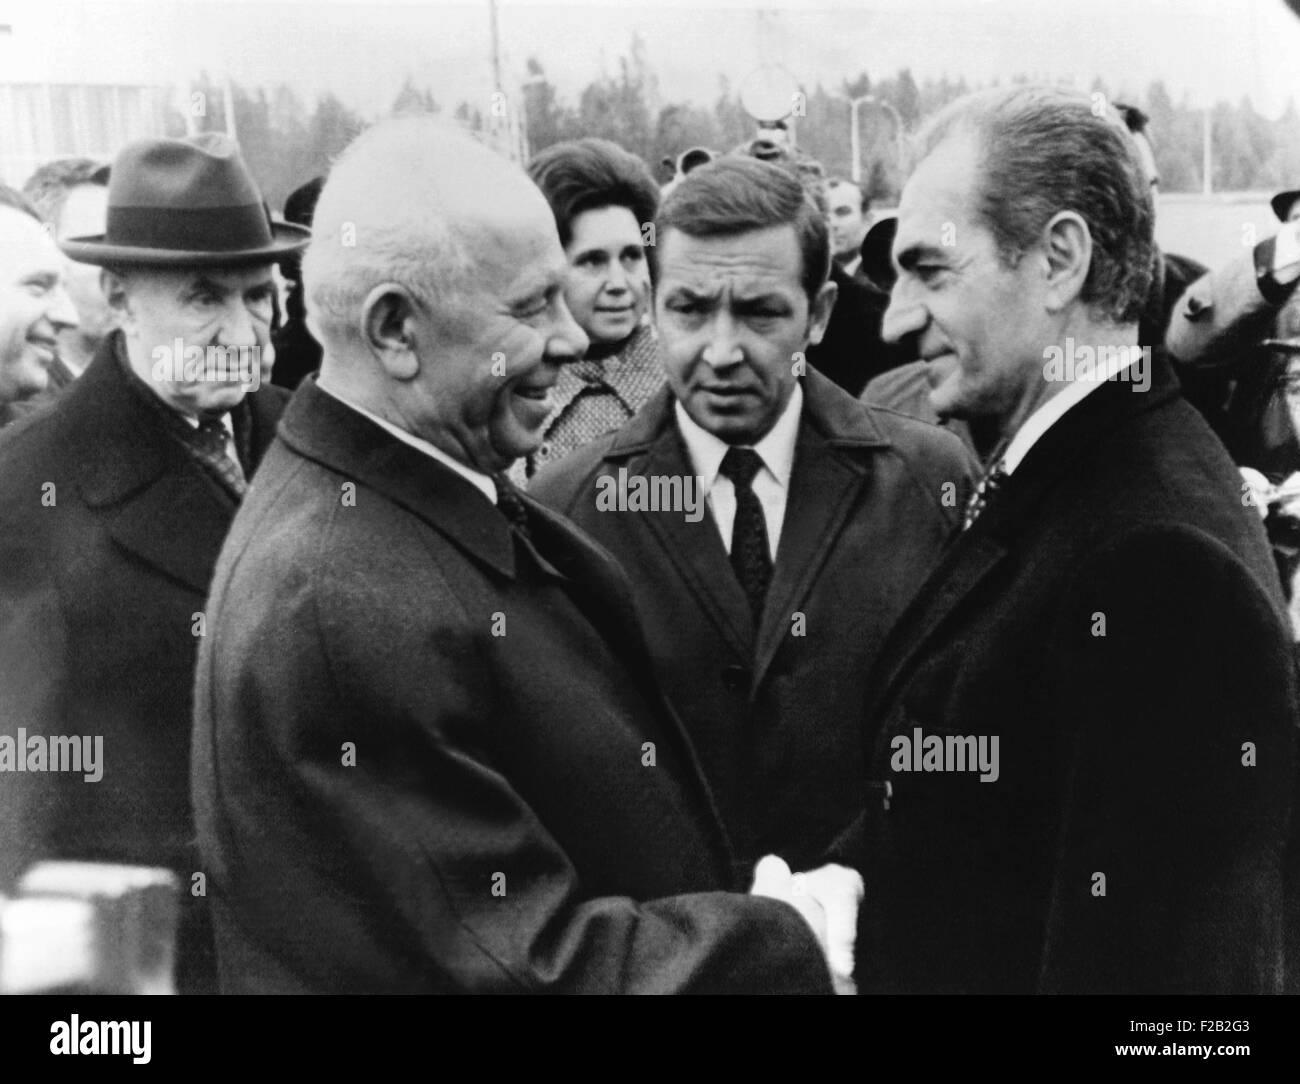 Shah of Iran, with Soviet President Nikolai Podgorny and Premier Alexi Kosygin (left). Oct. 10, 1972. Iran and USSR - Stock Image